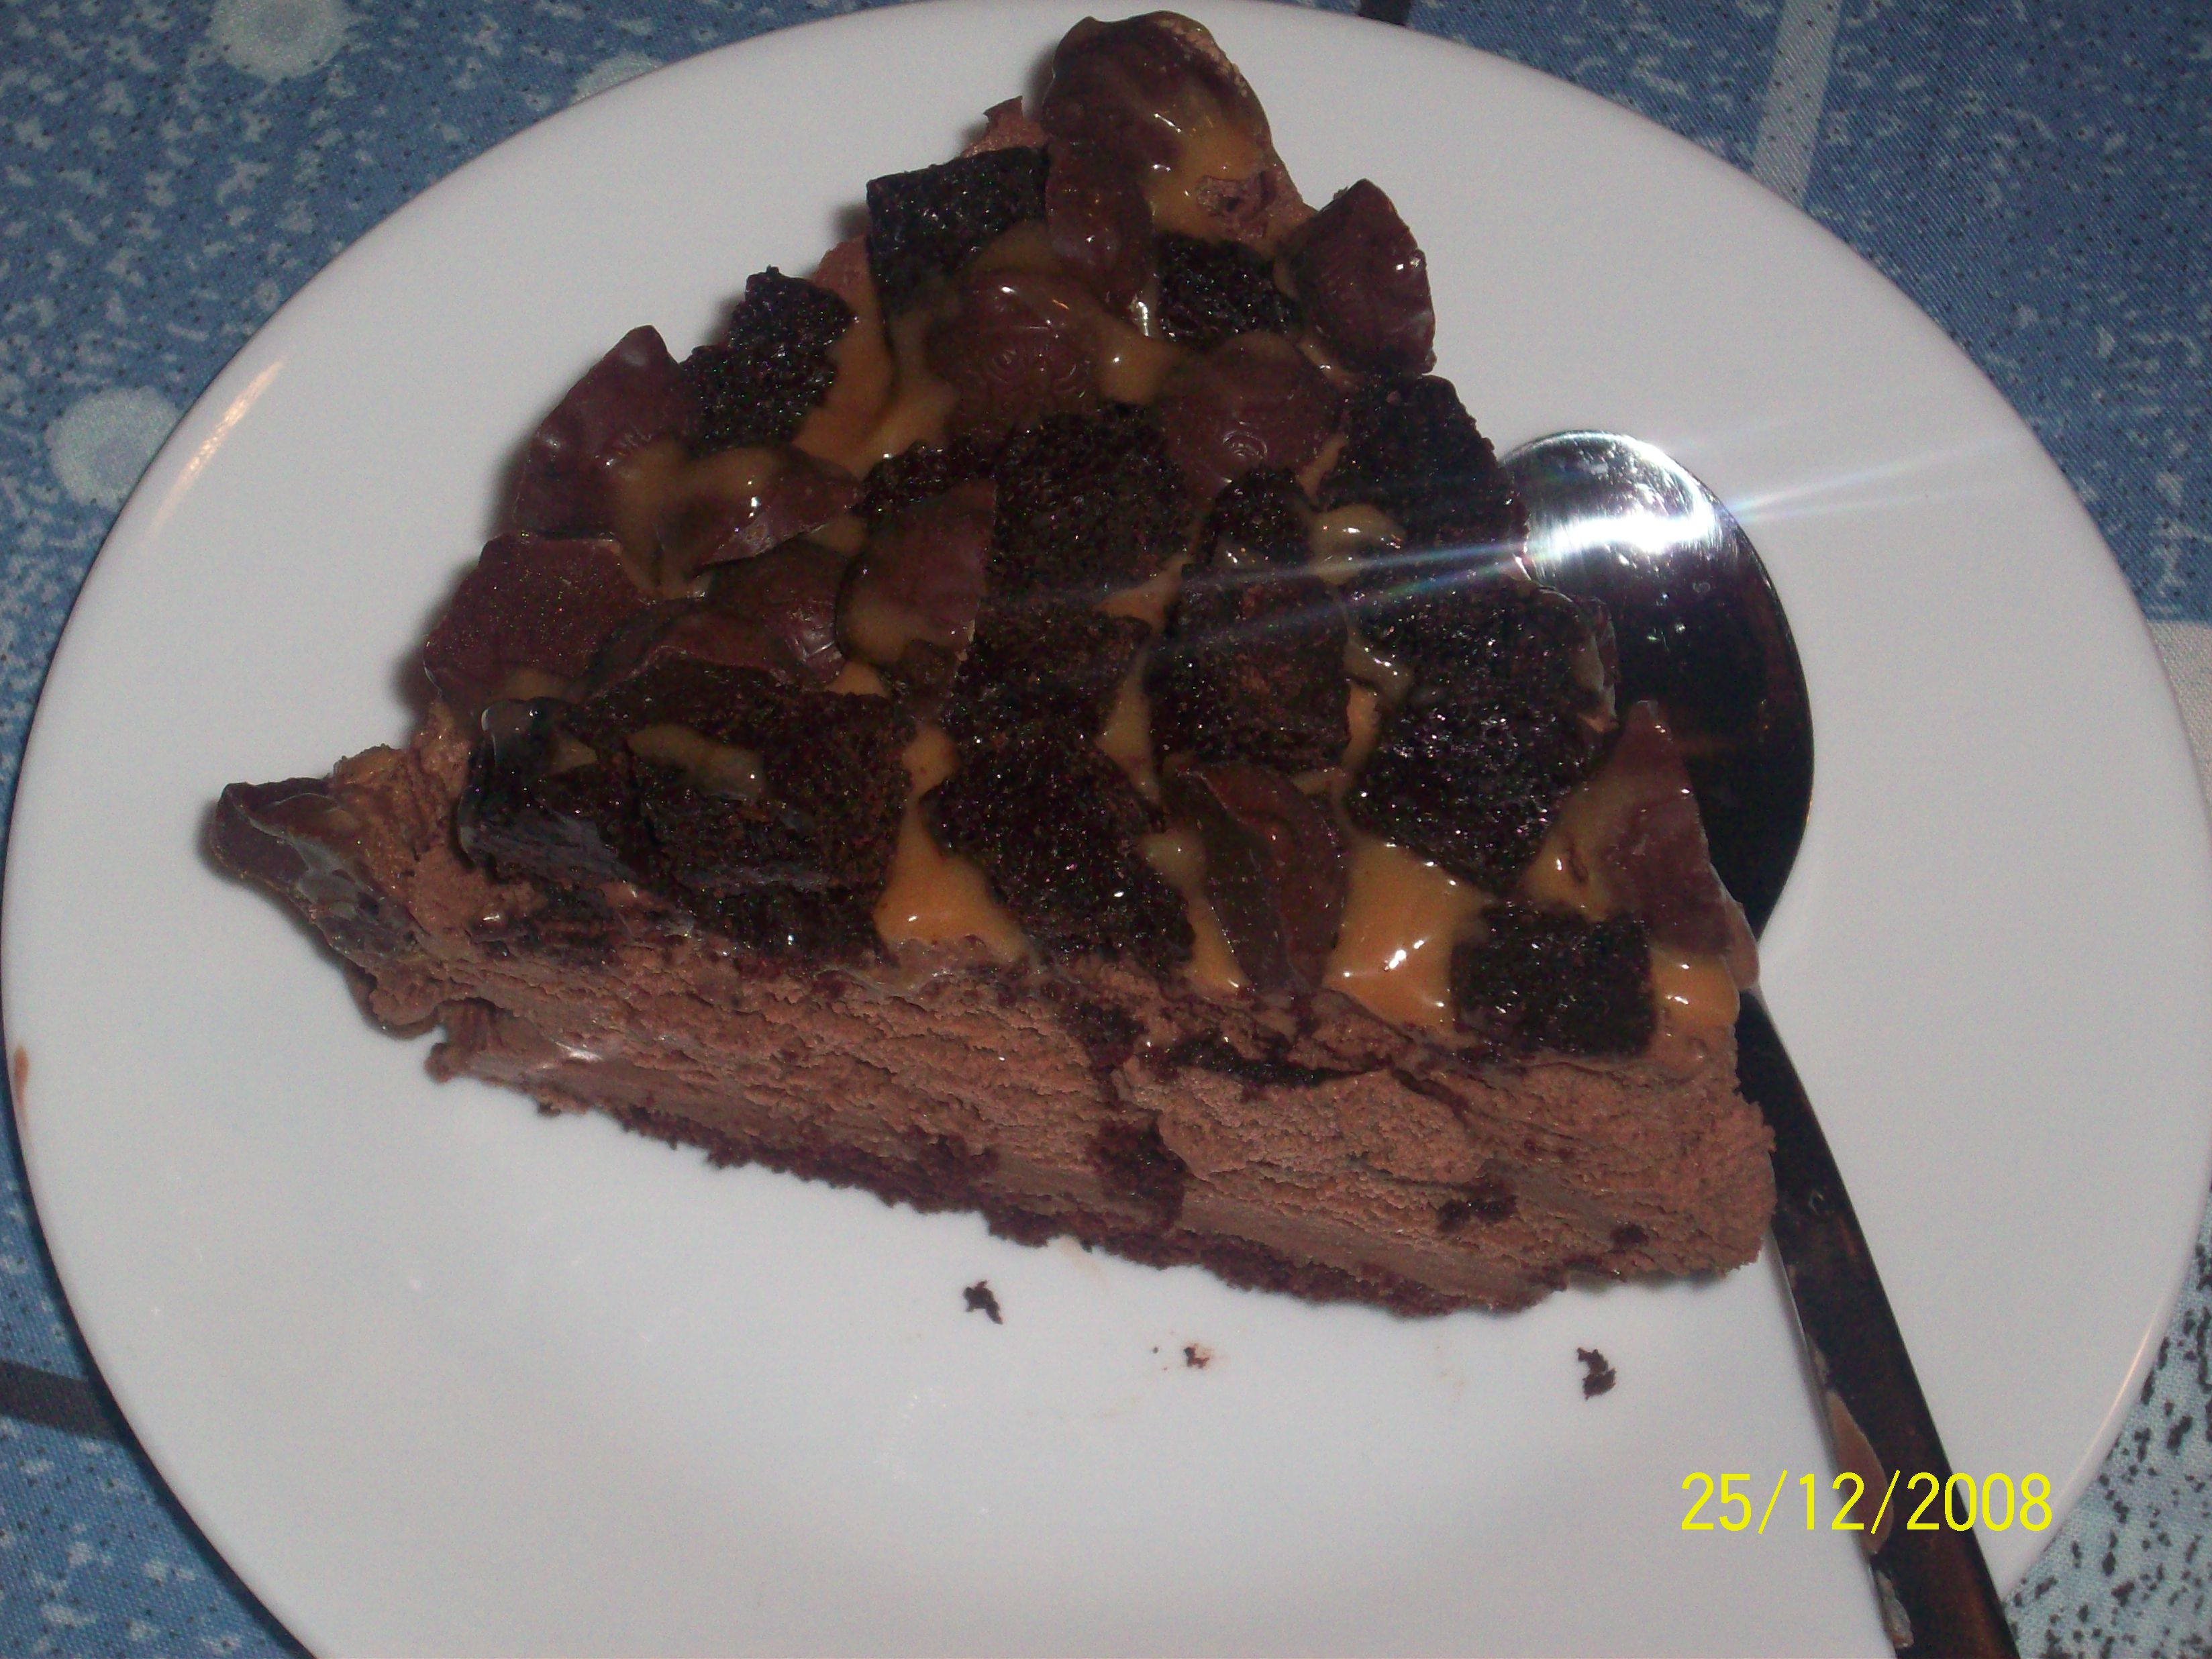 http://foodloader.net/cutie_2008-12-25_Choco_Caramel_Ice_Cream_Cake.jpg